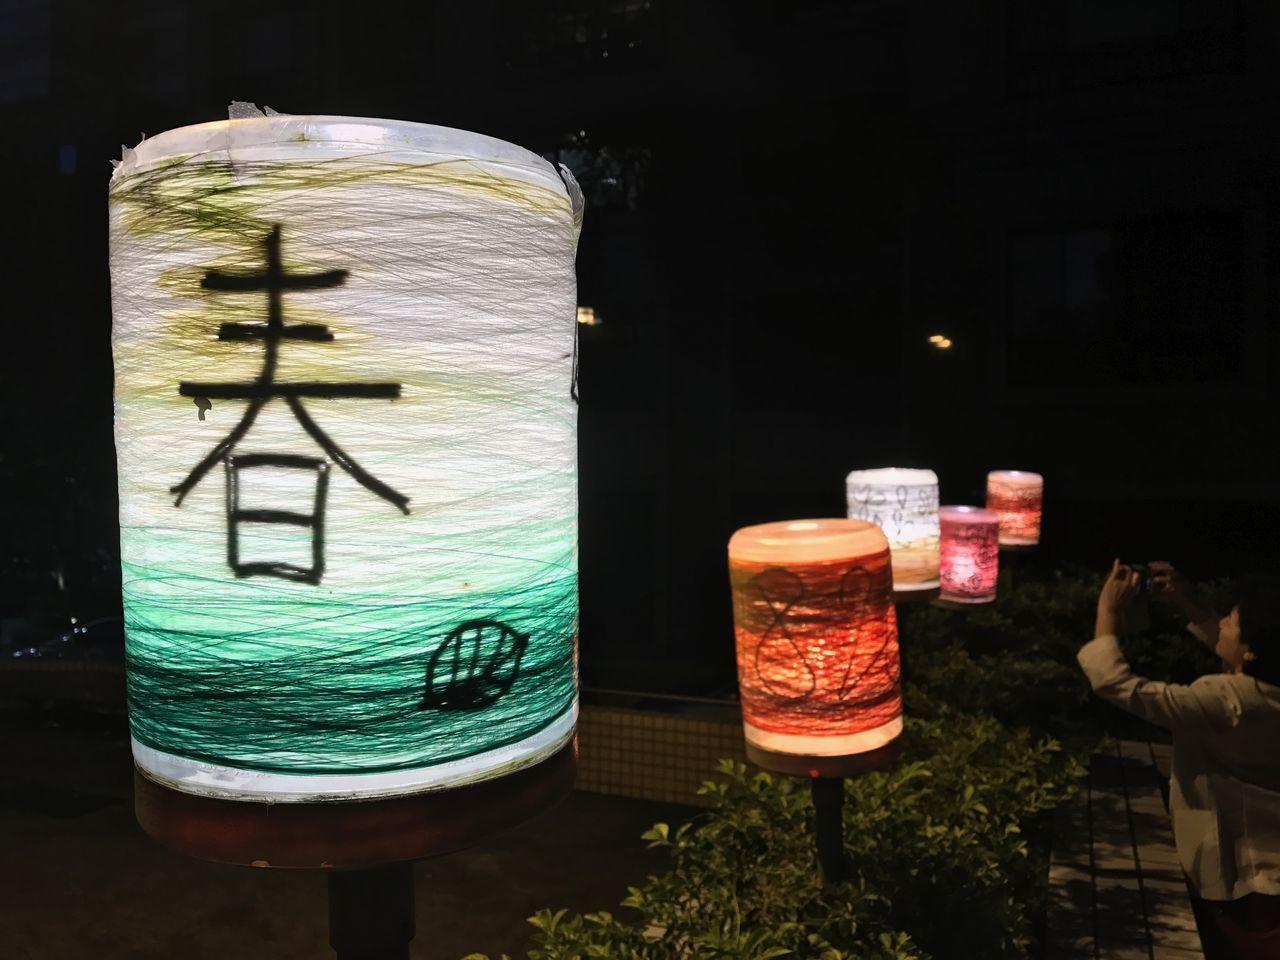 Close-up Illuminated Lanterns Night Lights Outdoors Photographing Spring Text